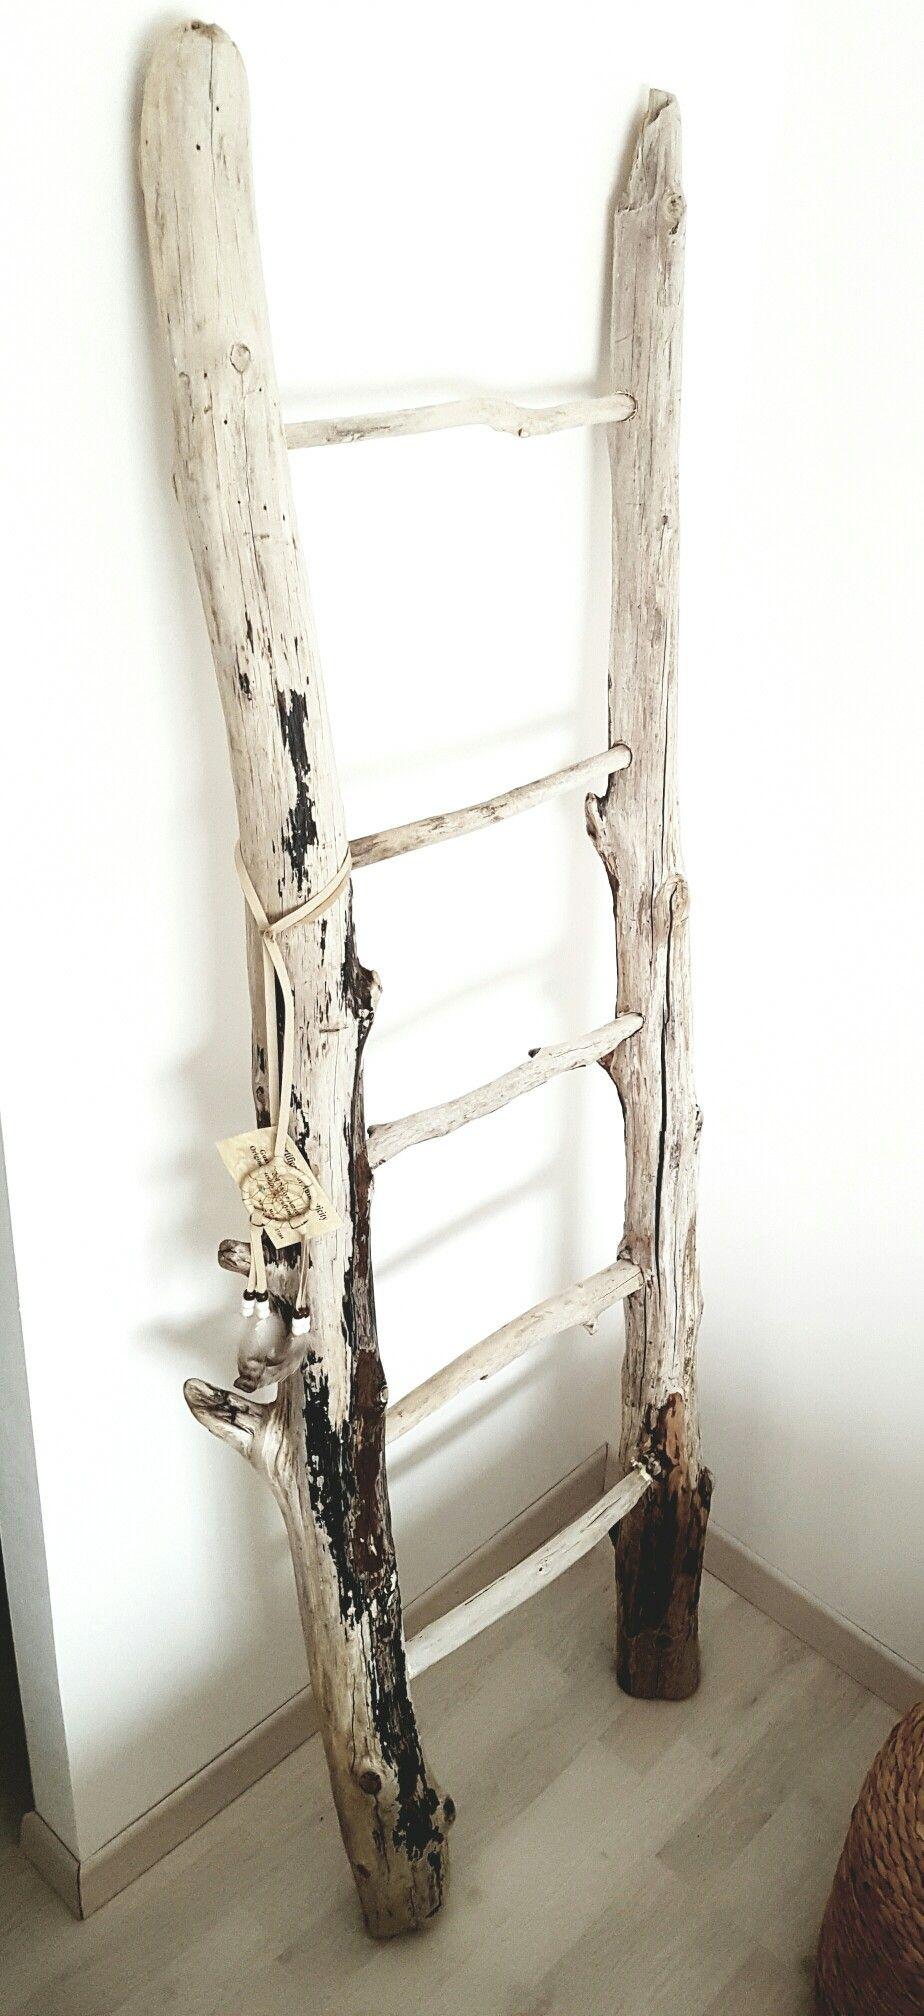 Deco Avec Une Echelle En Bois echelle en bois flotté | meubles en bois flotté, echelle